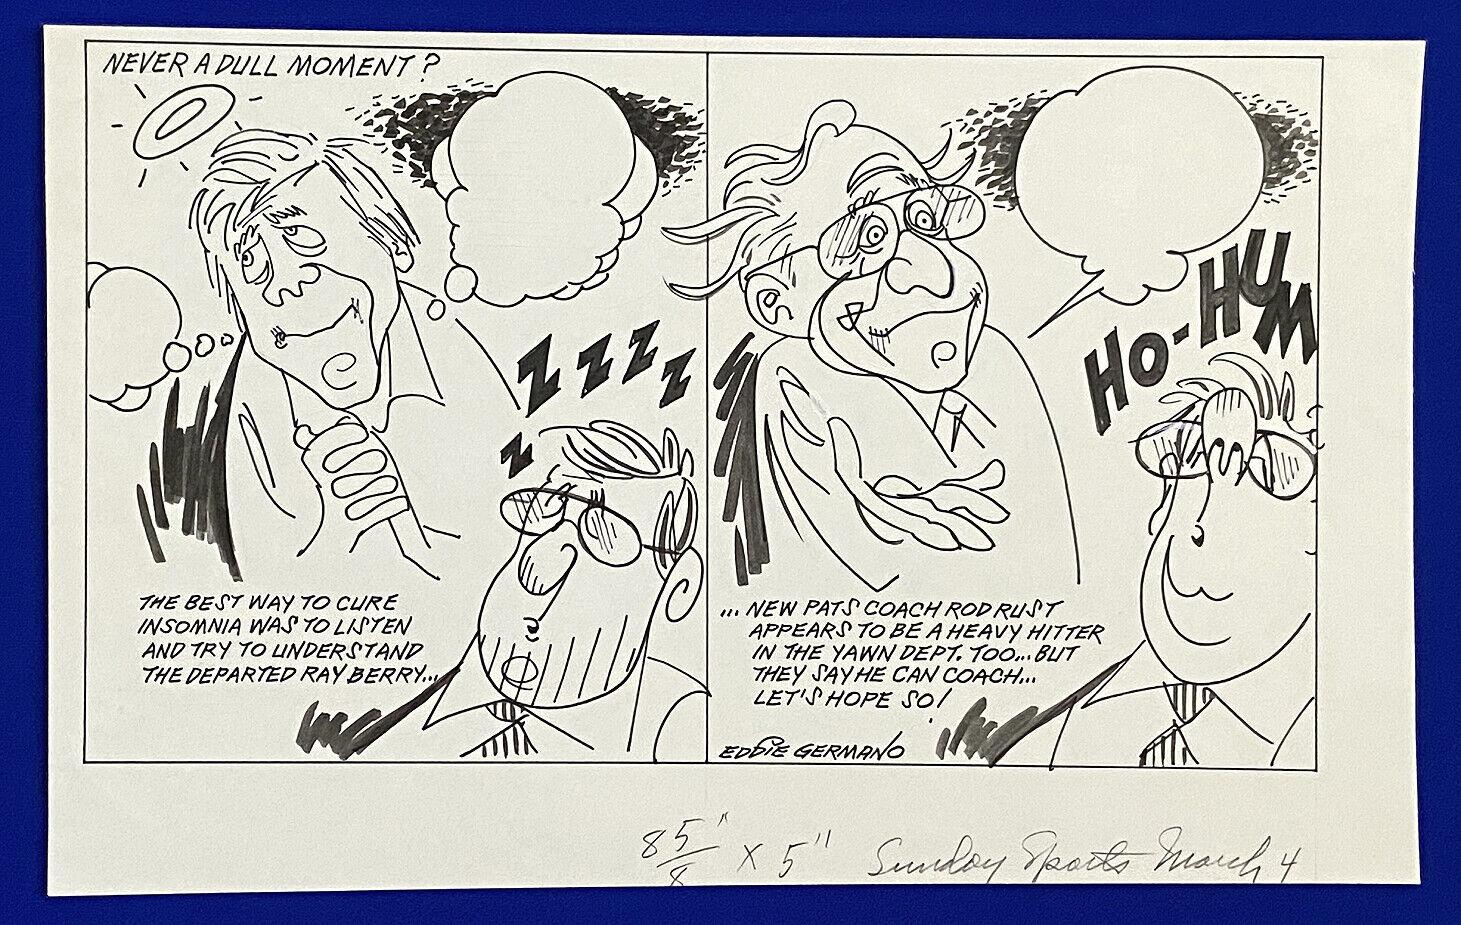 1990 patriots raymond berry rod rust never a dull moment? 12x19 original cartoon